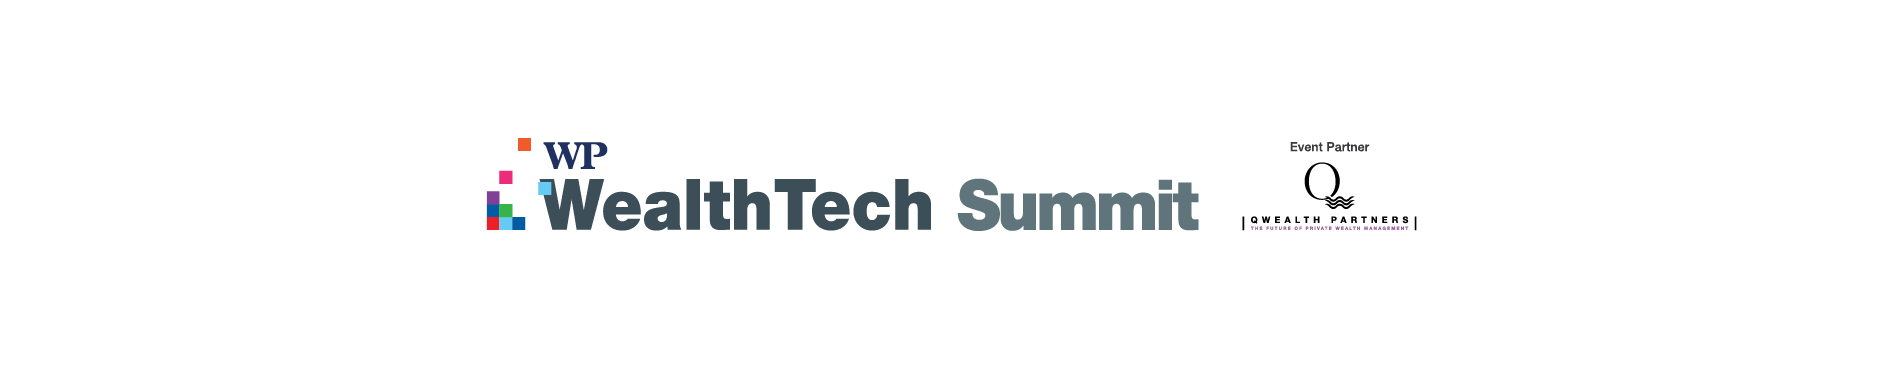 WP WealthTech Summit